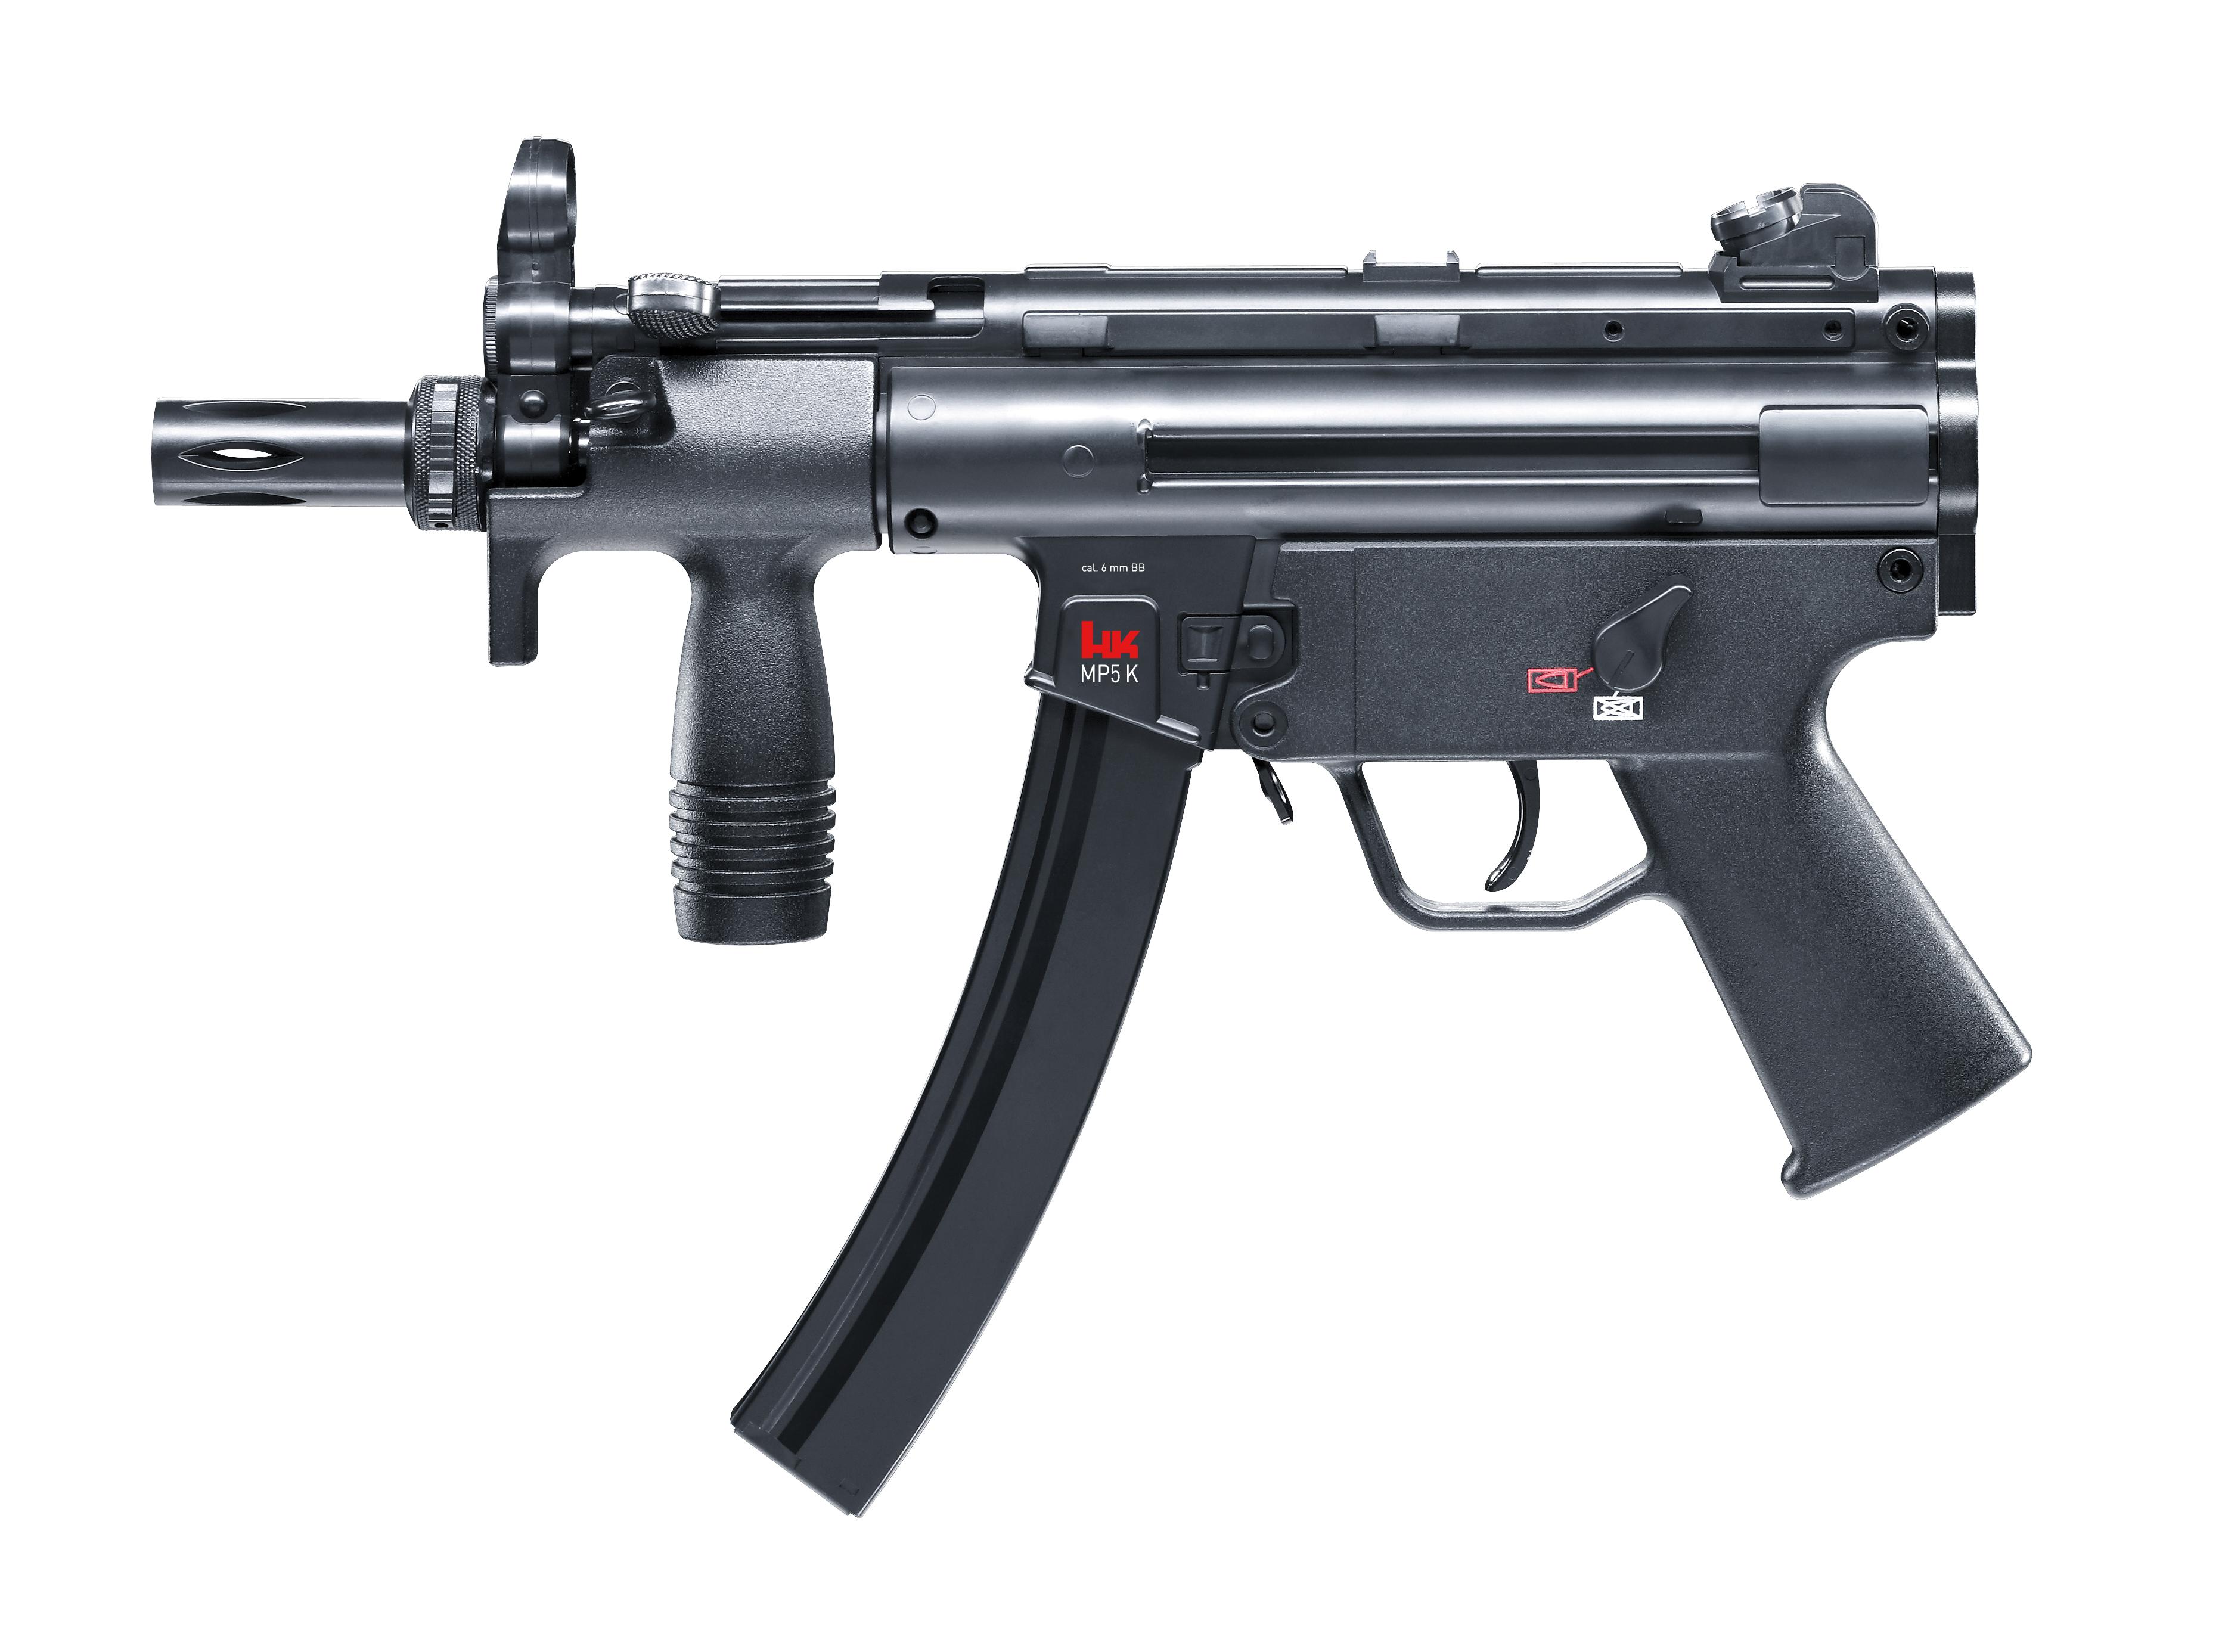 HECKLER & KOCH (Umarex) Airsoft CO2 MP5 K